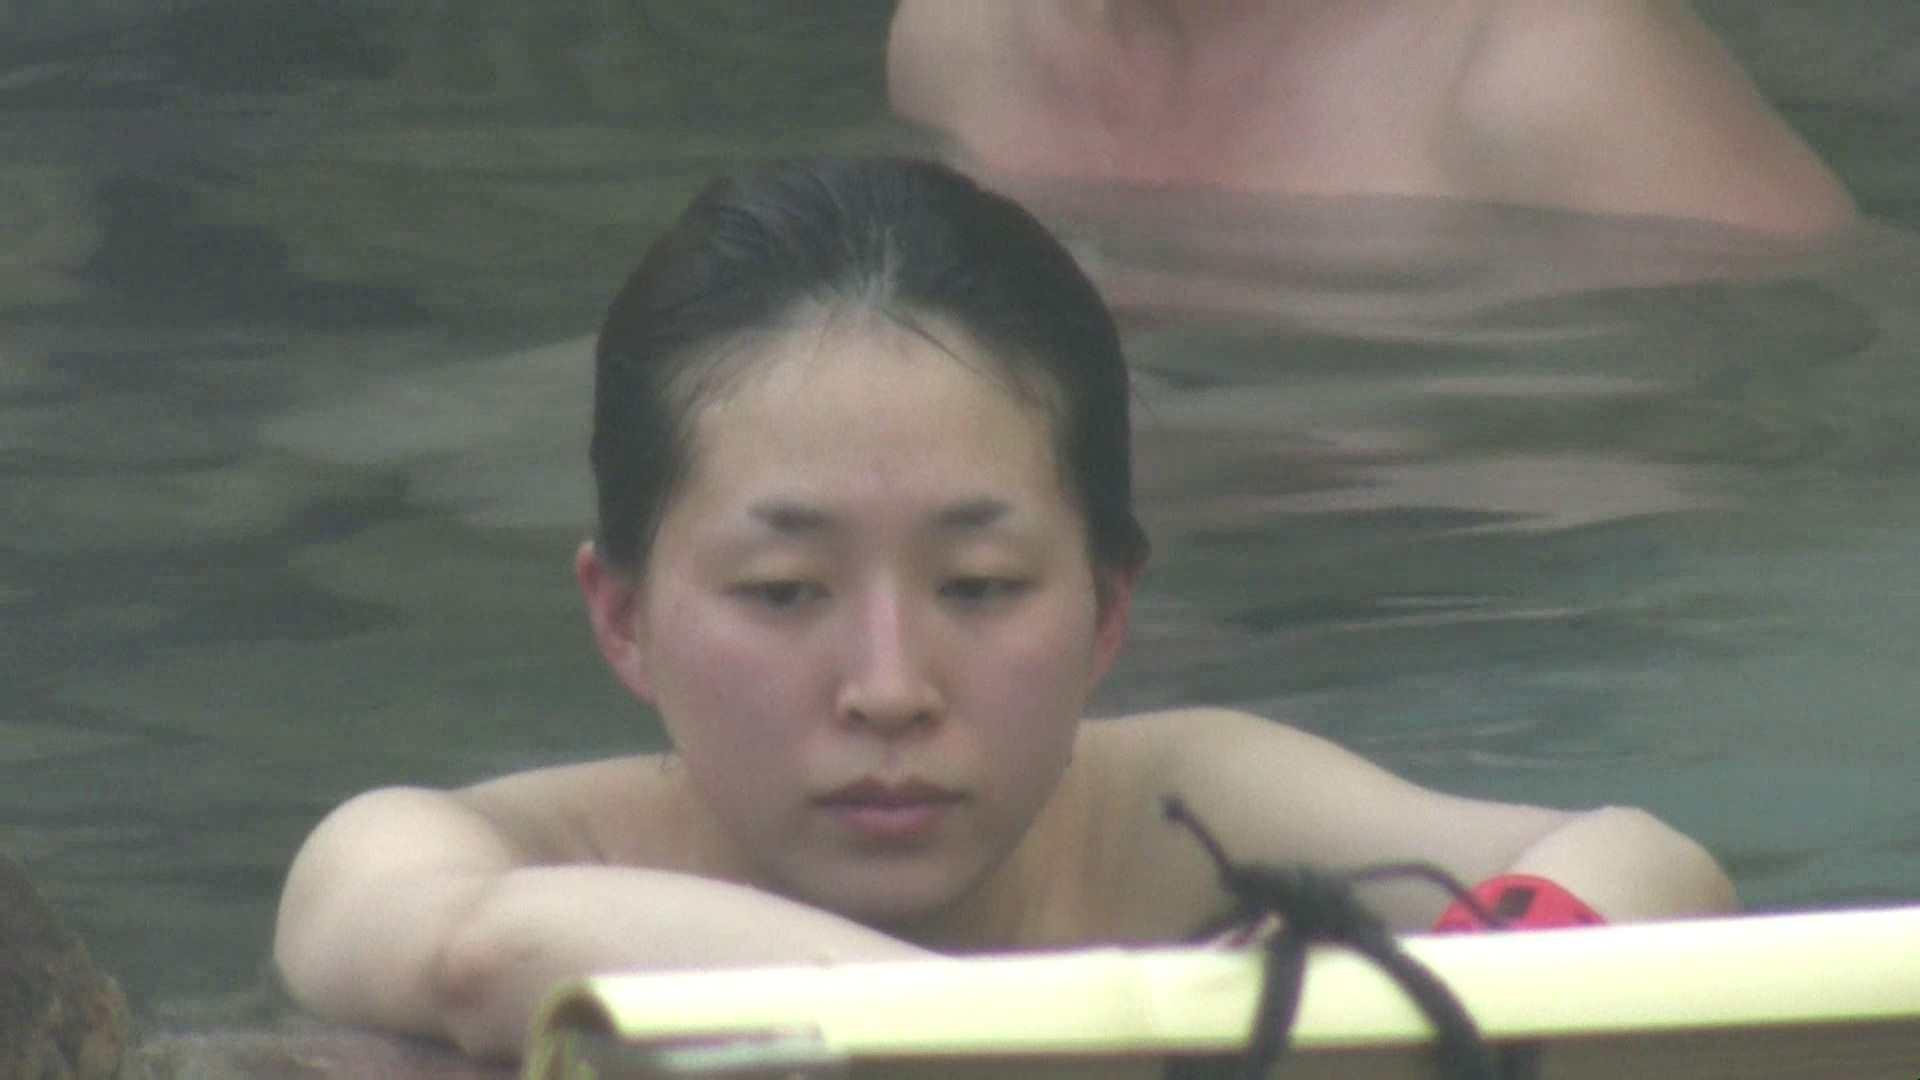 Aquaな露天風呂Vol.583 美しいOLの裸体 すけべAV動画紹介 103pic 65